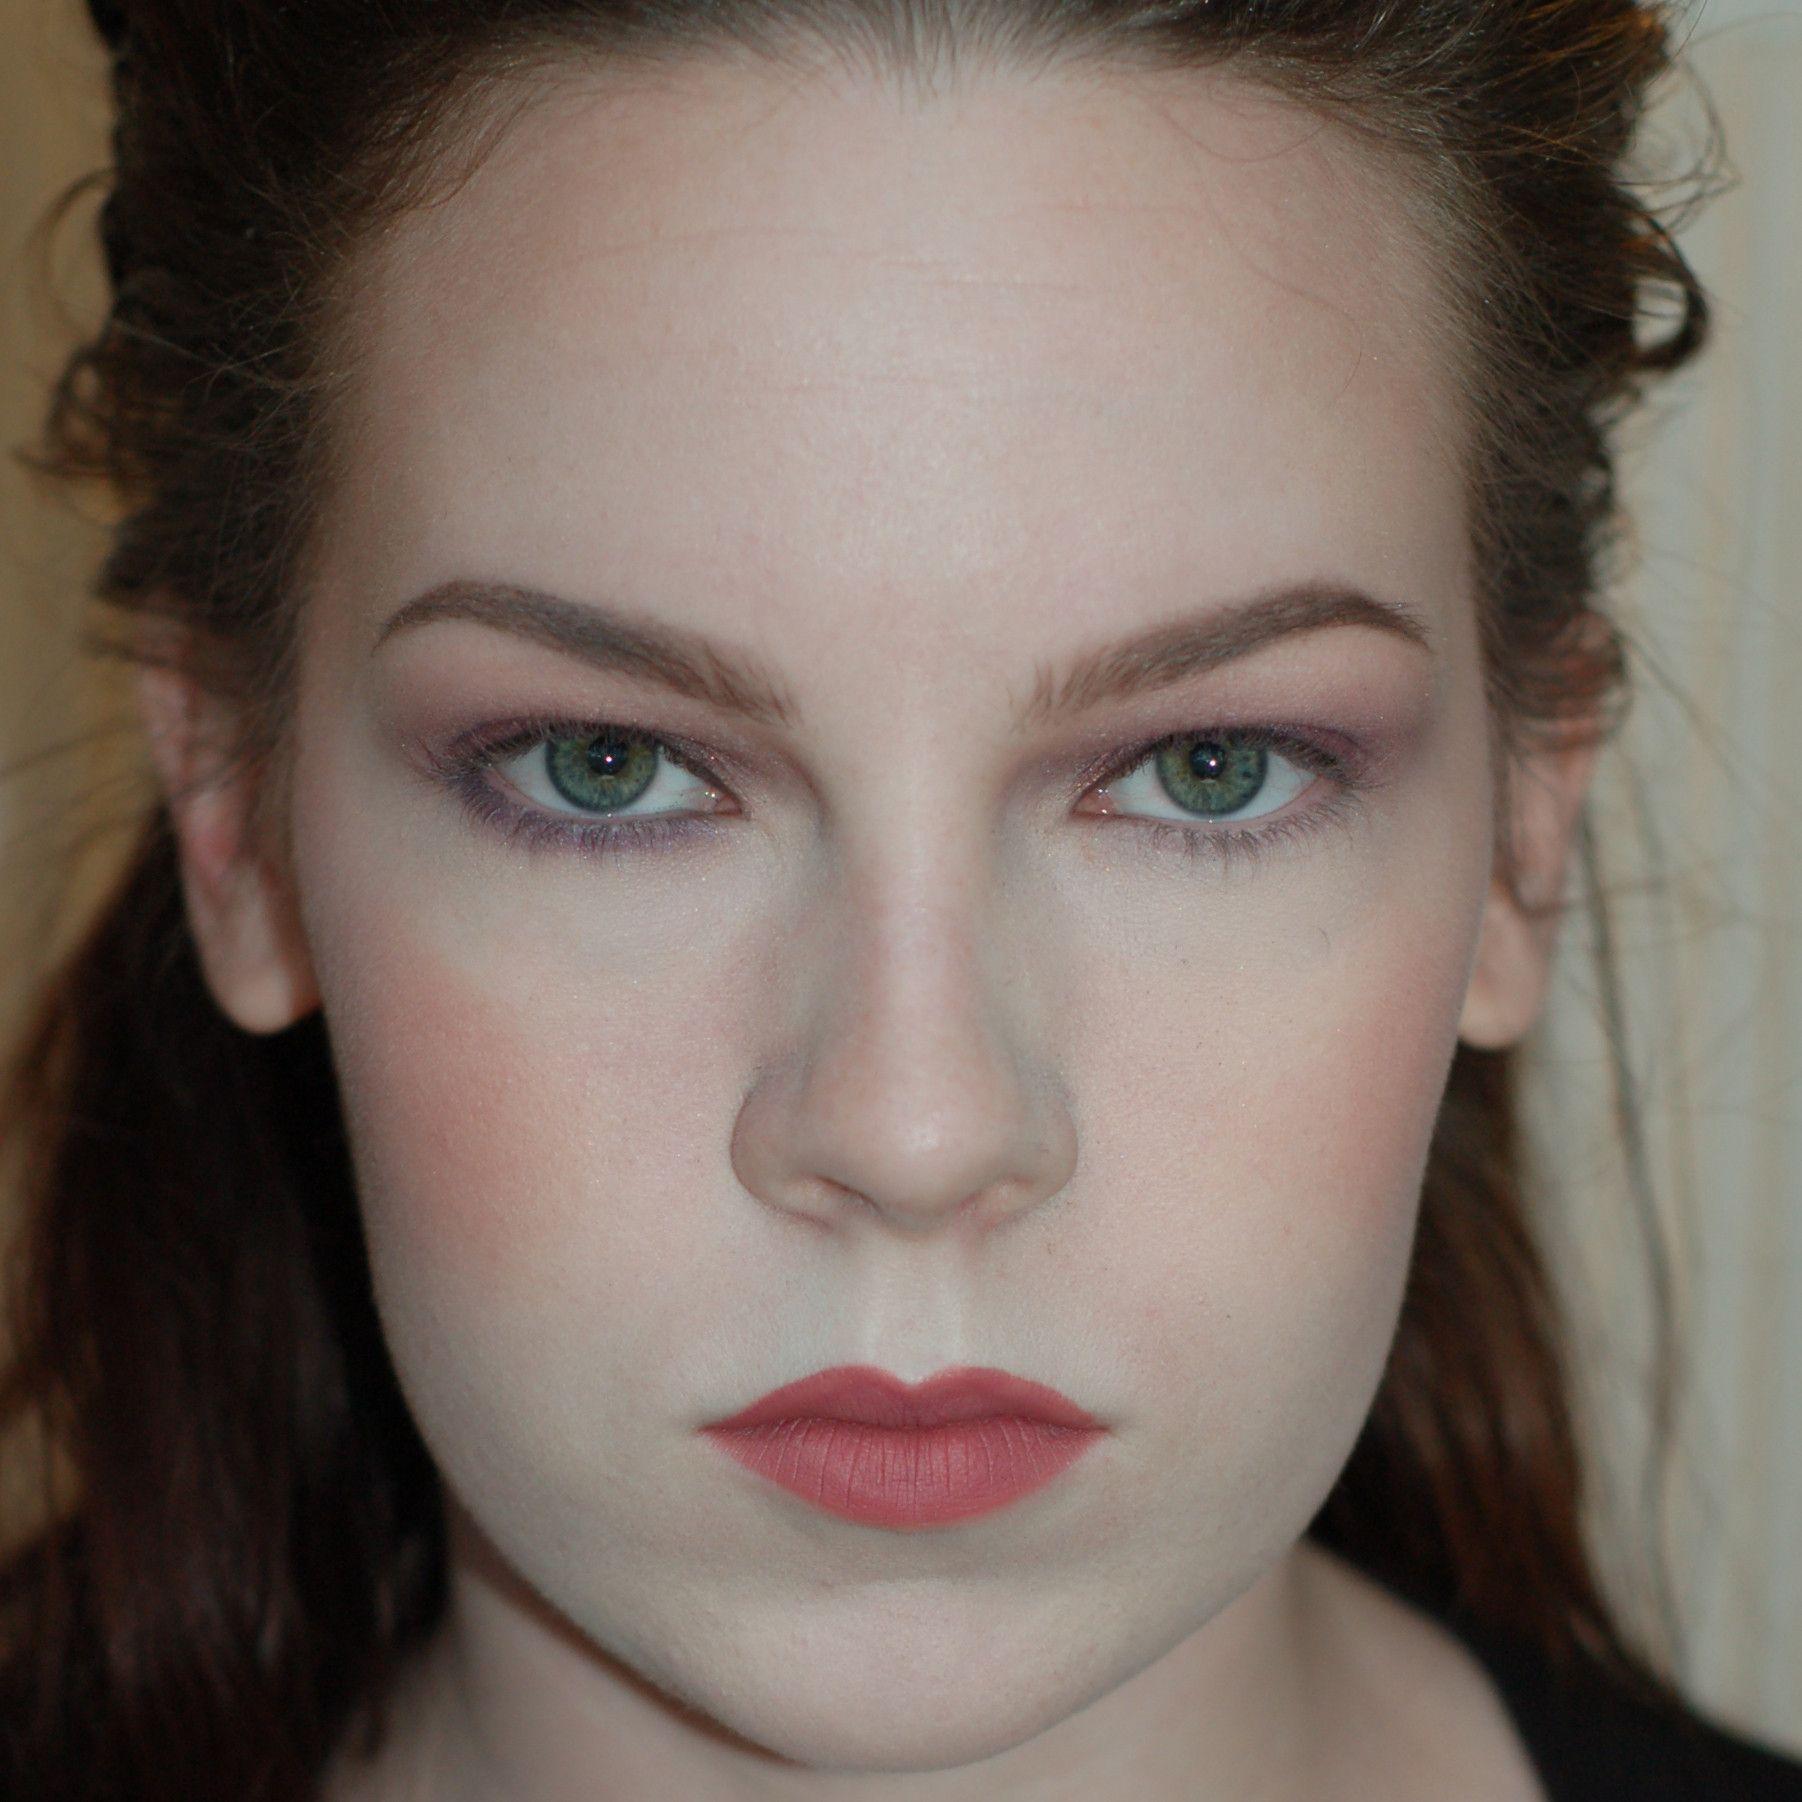 Imgur Hooded eyes, Hooded eye makeup, Eye makeup images